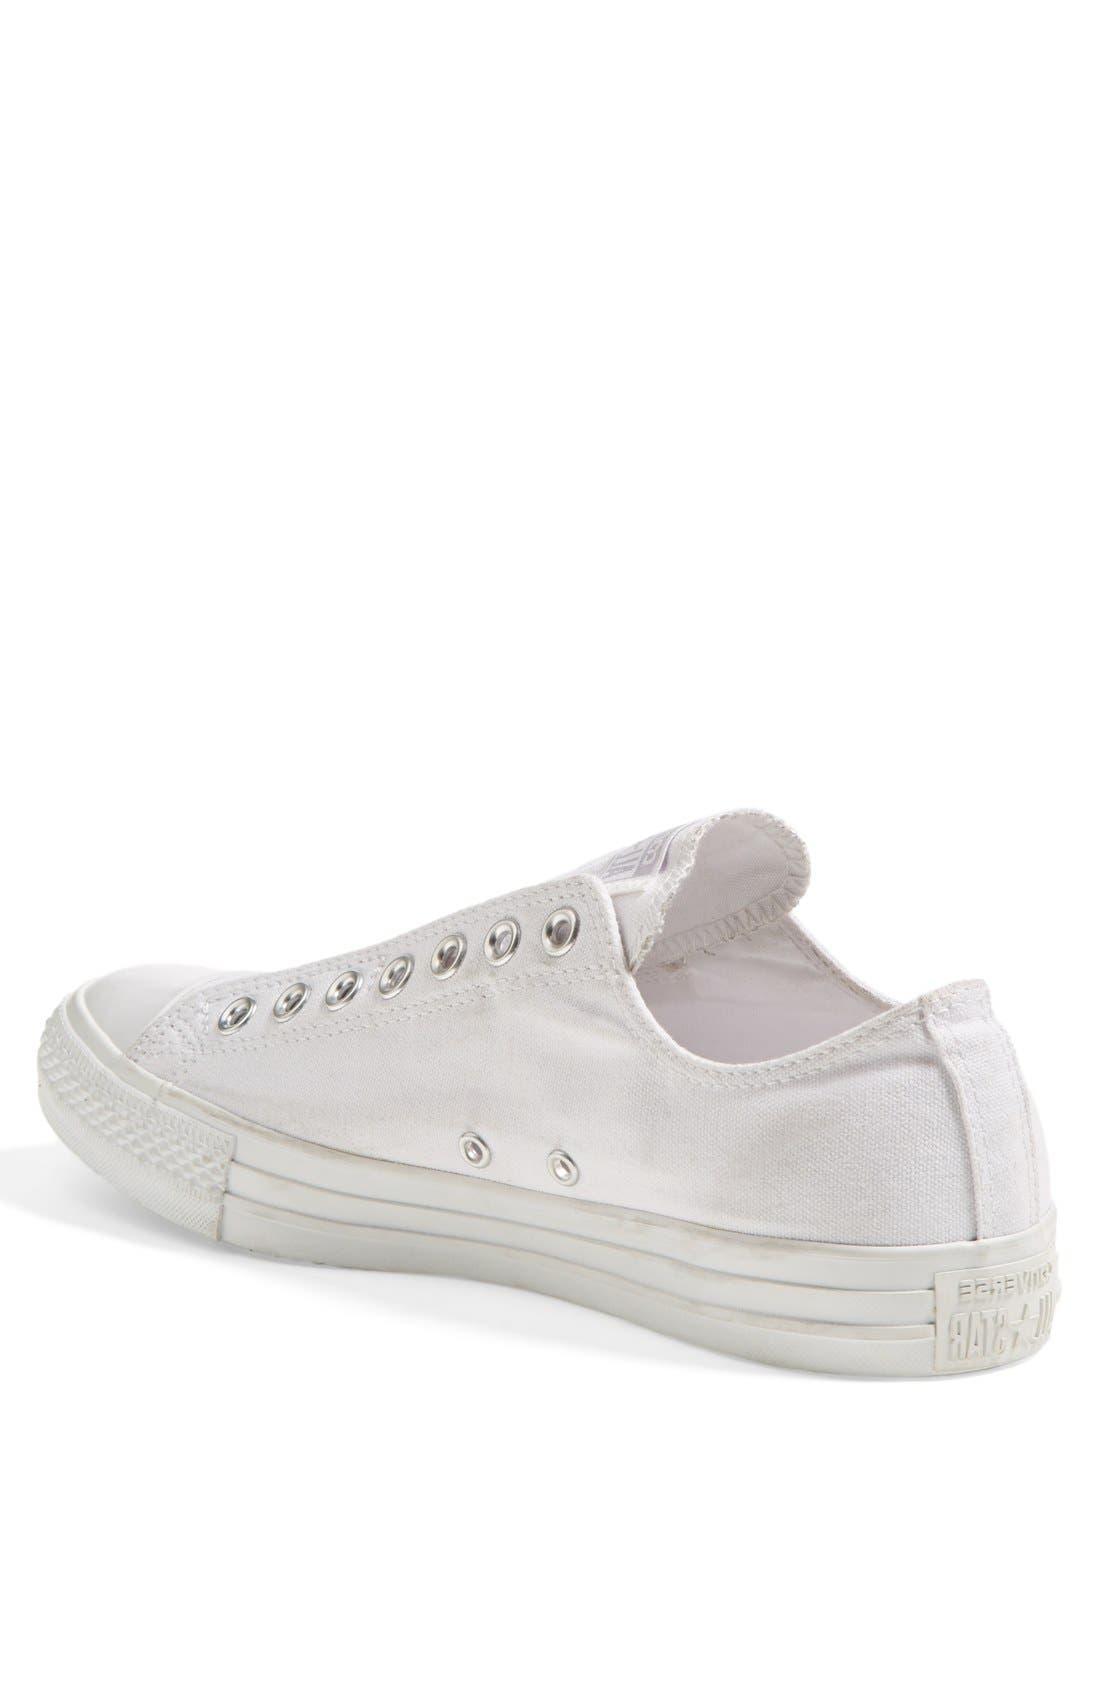 Alternate Image 2  - Converse Chuck Taylor® All Star® Slip-On Sneaker (Men)